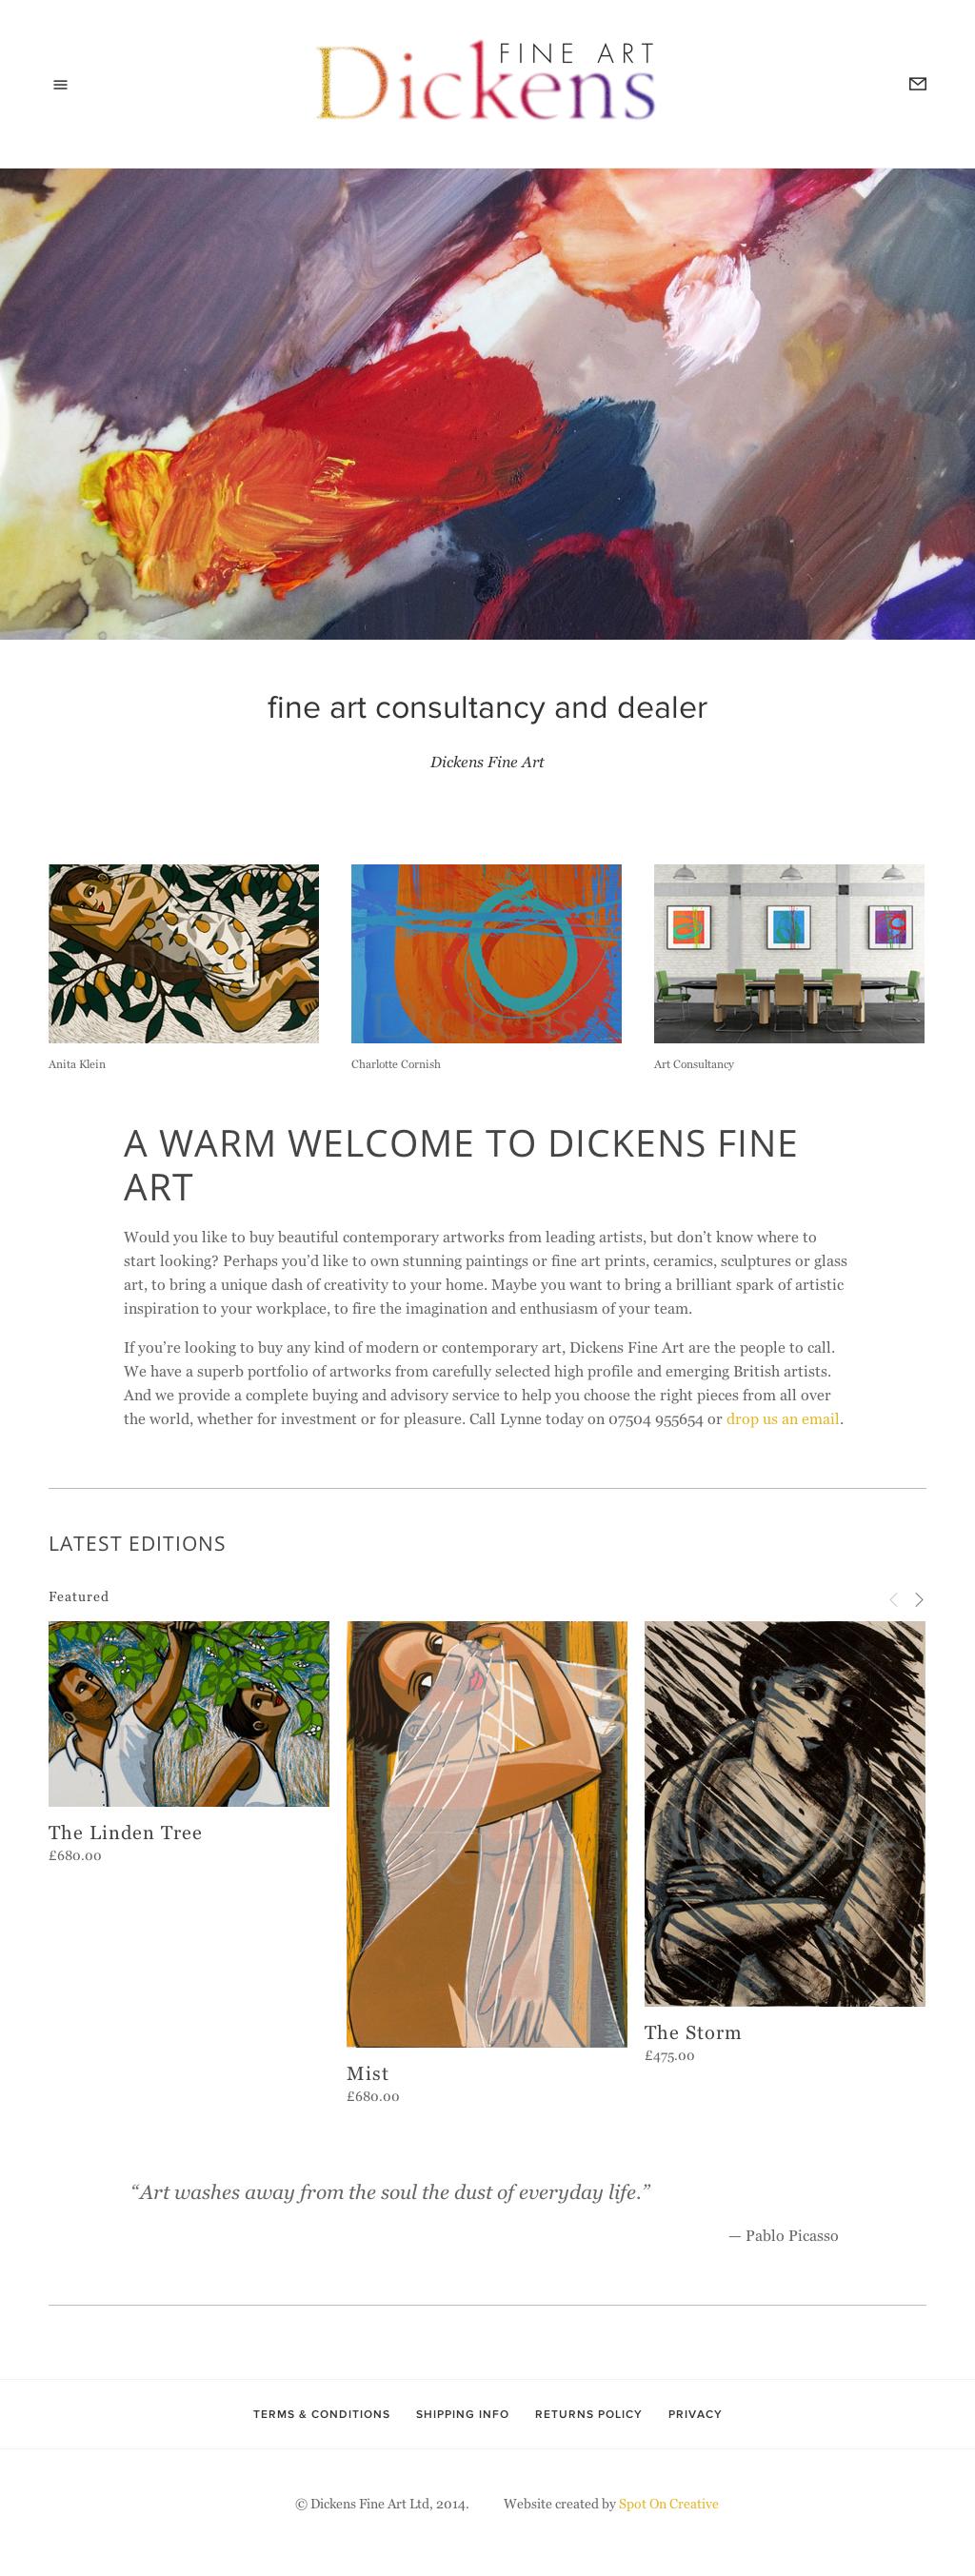 dickensfineart_website_by_spotoncreative